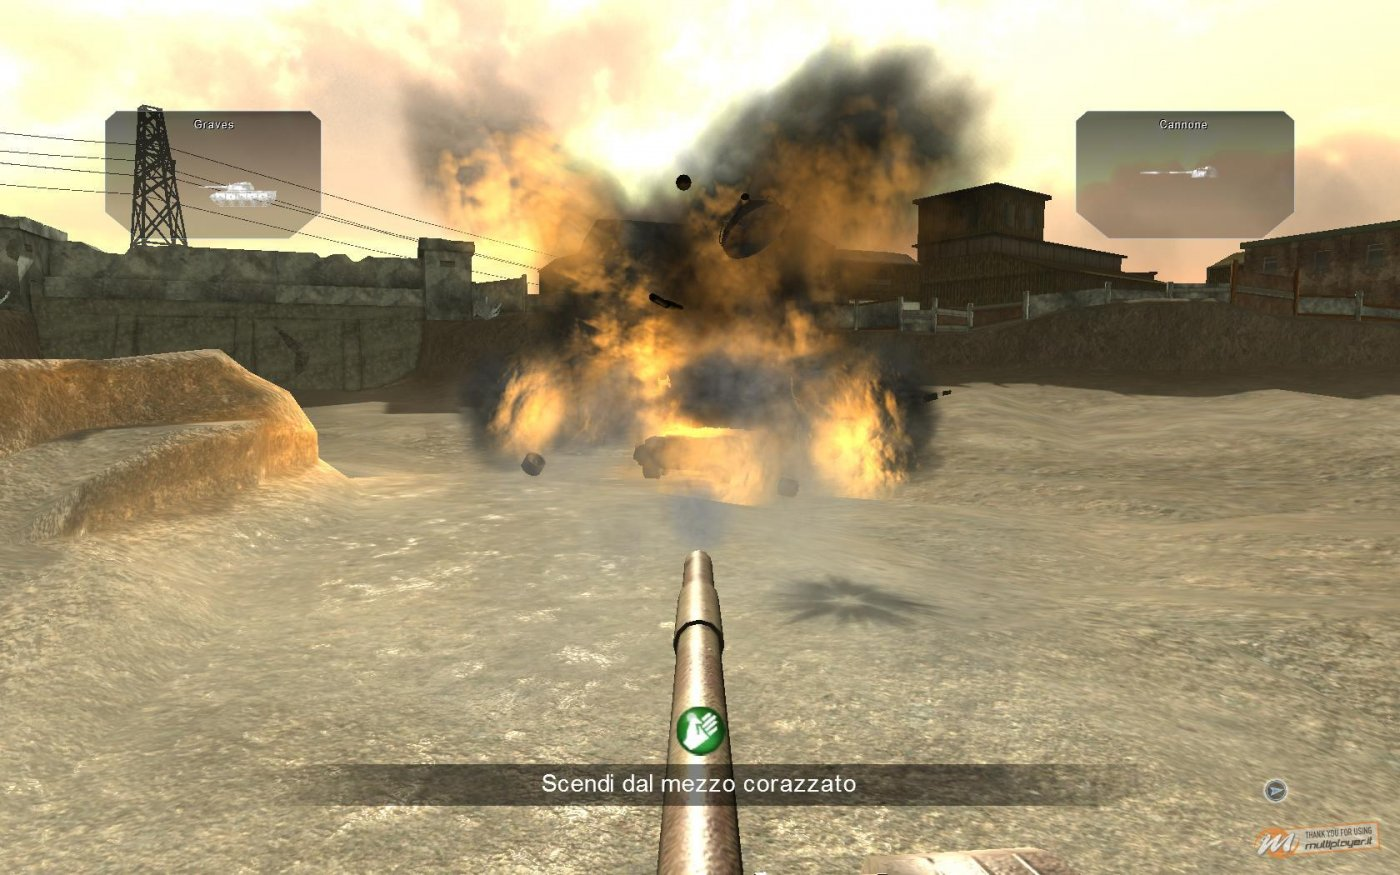 https://www.ign.com/games/conflict-denied-ops